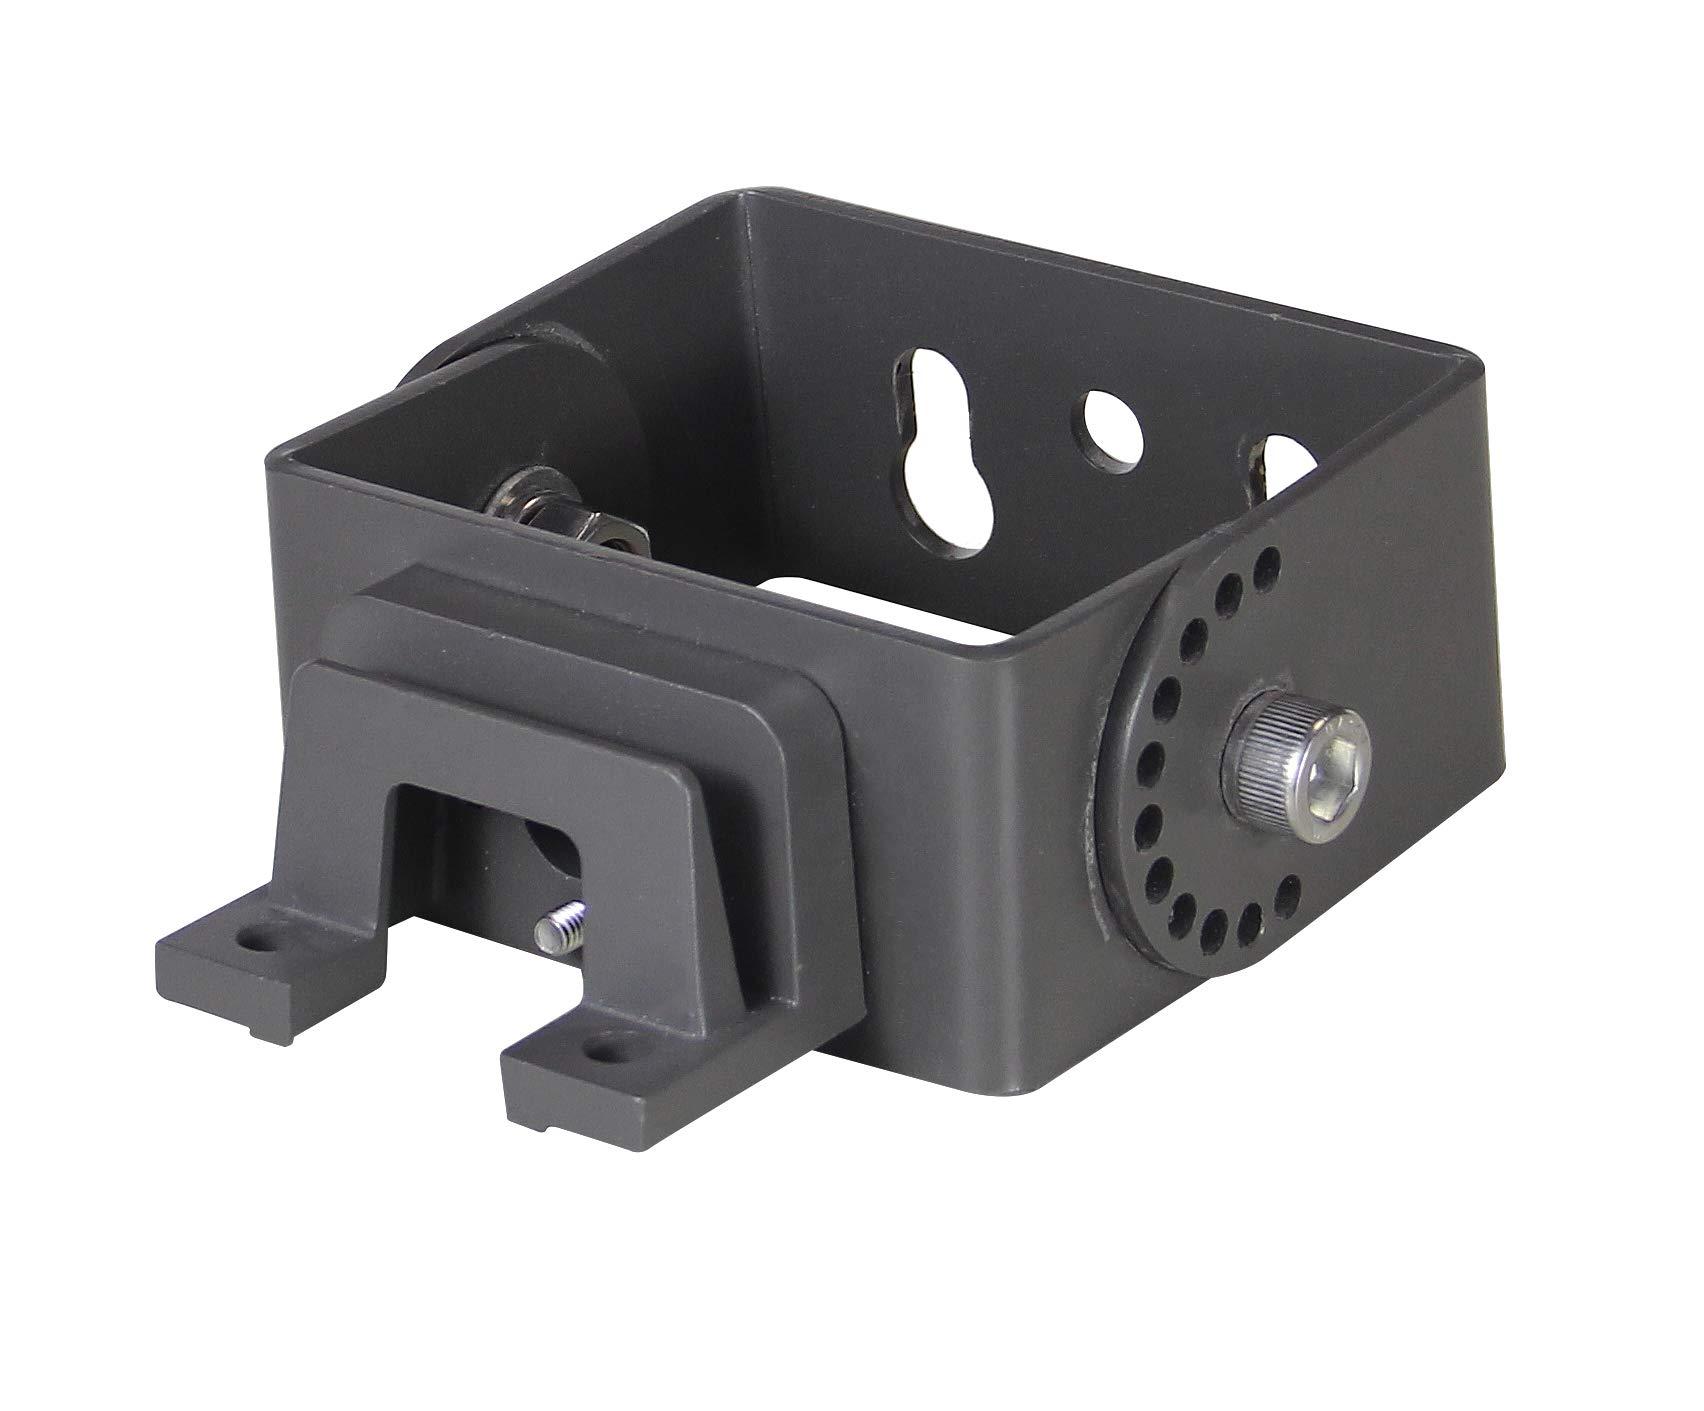 Trunnion Mount Bracket for Kadision LED Parking Lot Light, Shoebox Adapter Street Light Mounting Accessories